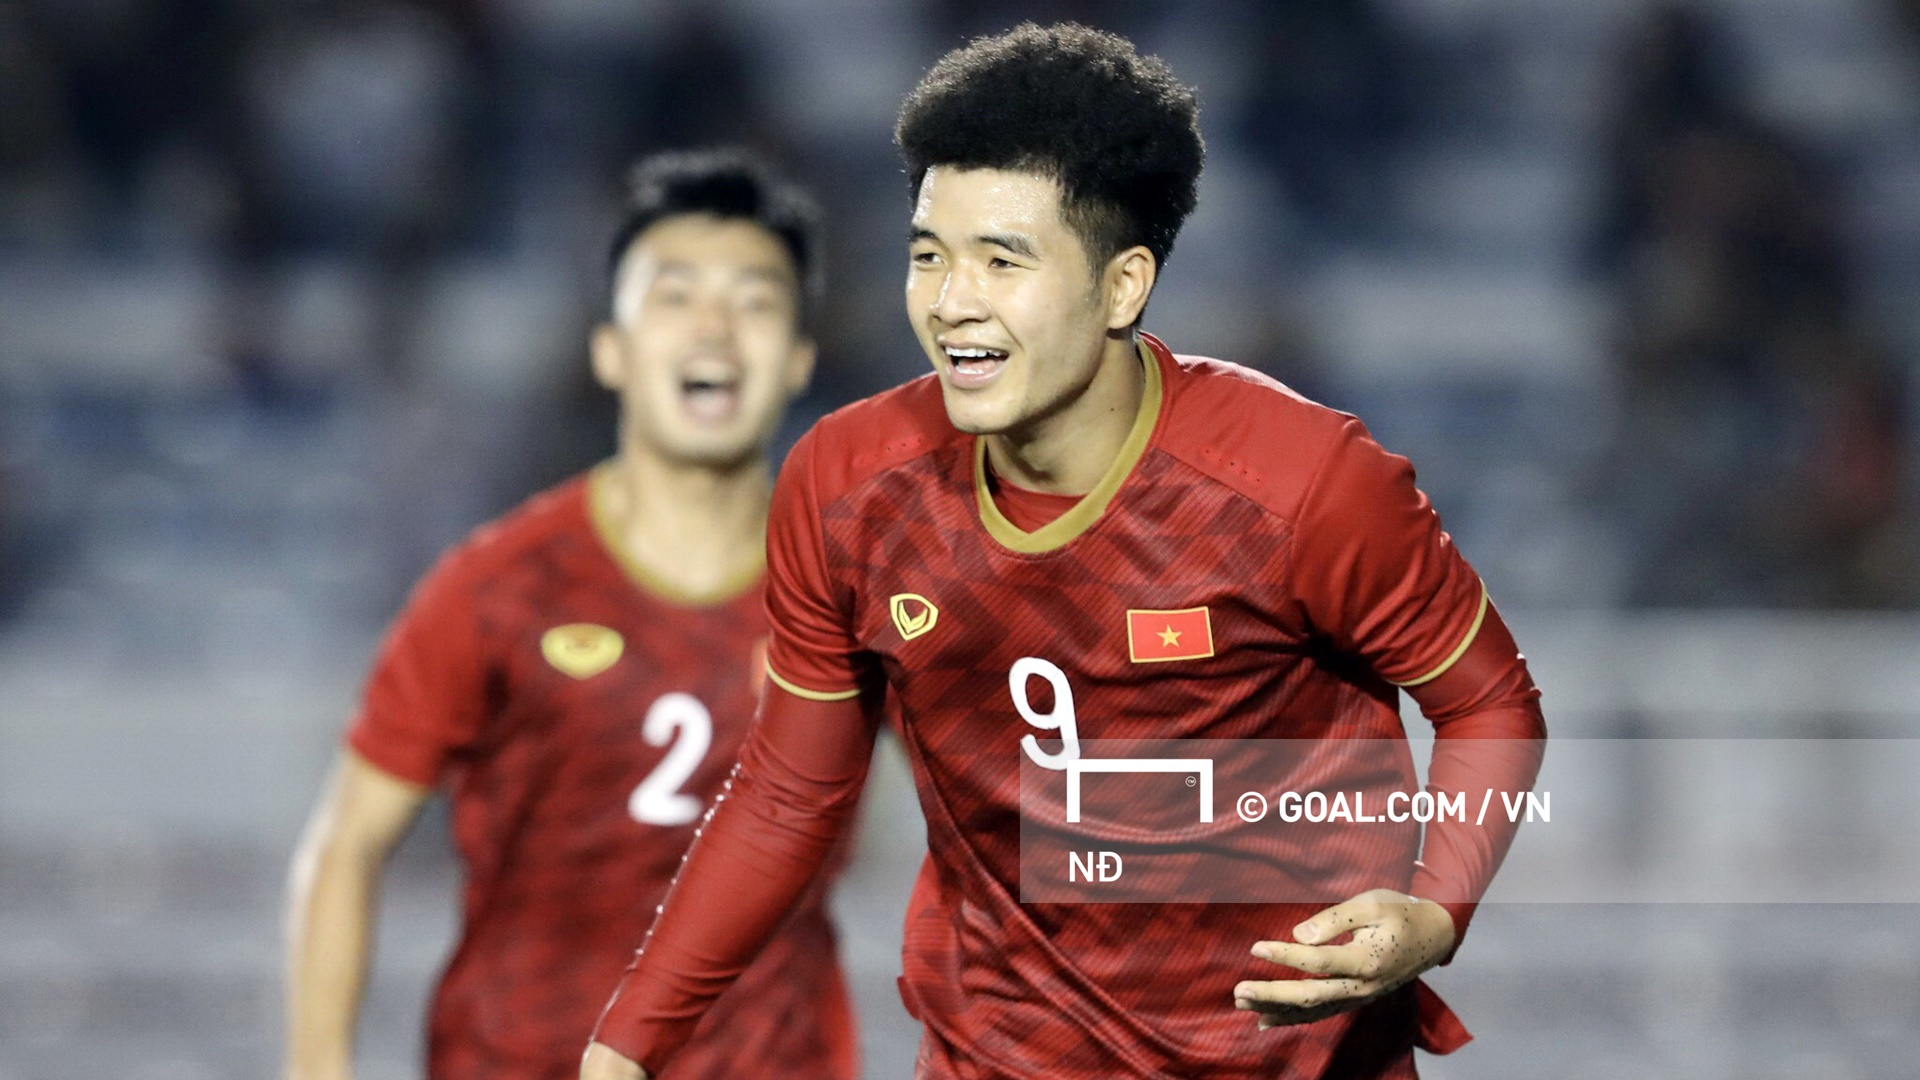 Ha Duc Chinh - Do Thanh Thinh | U22 Vietnam vs U22 Cambodia | SEA Games 30 - 2019 | Semif-finals